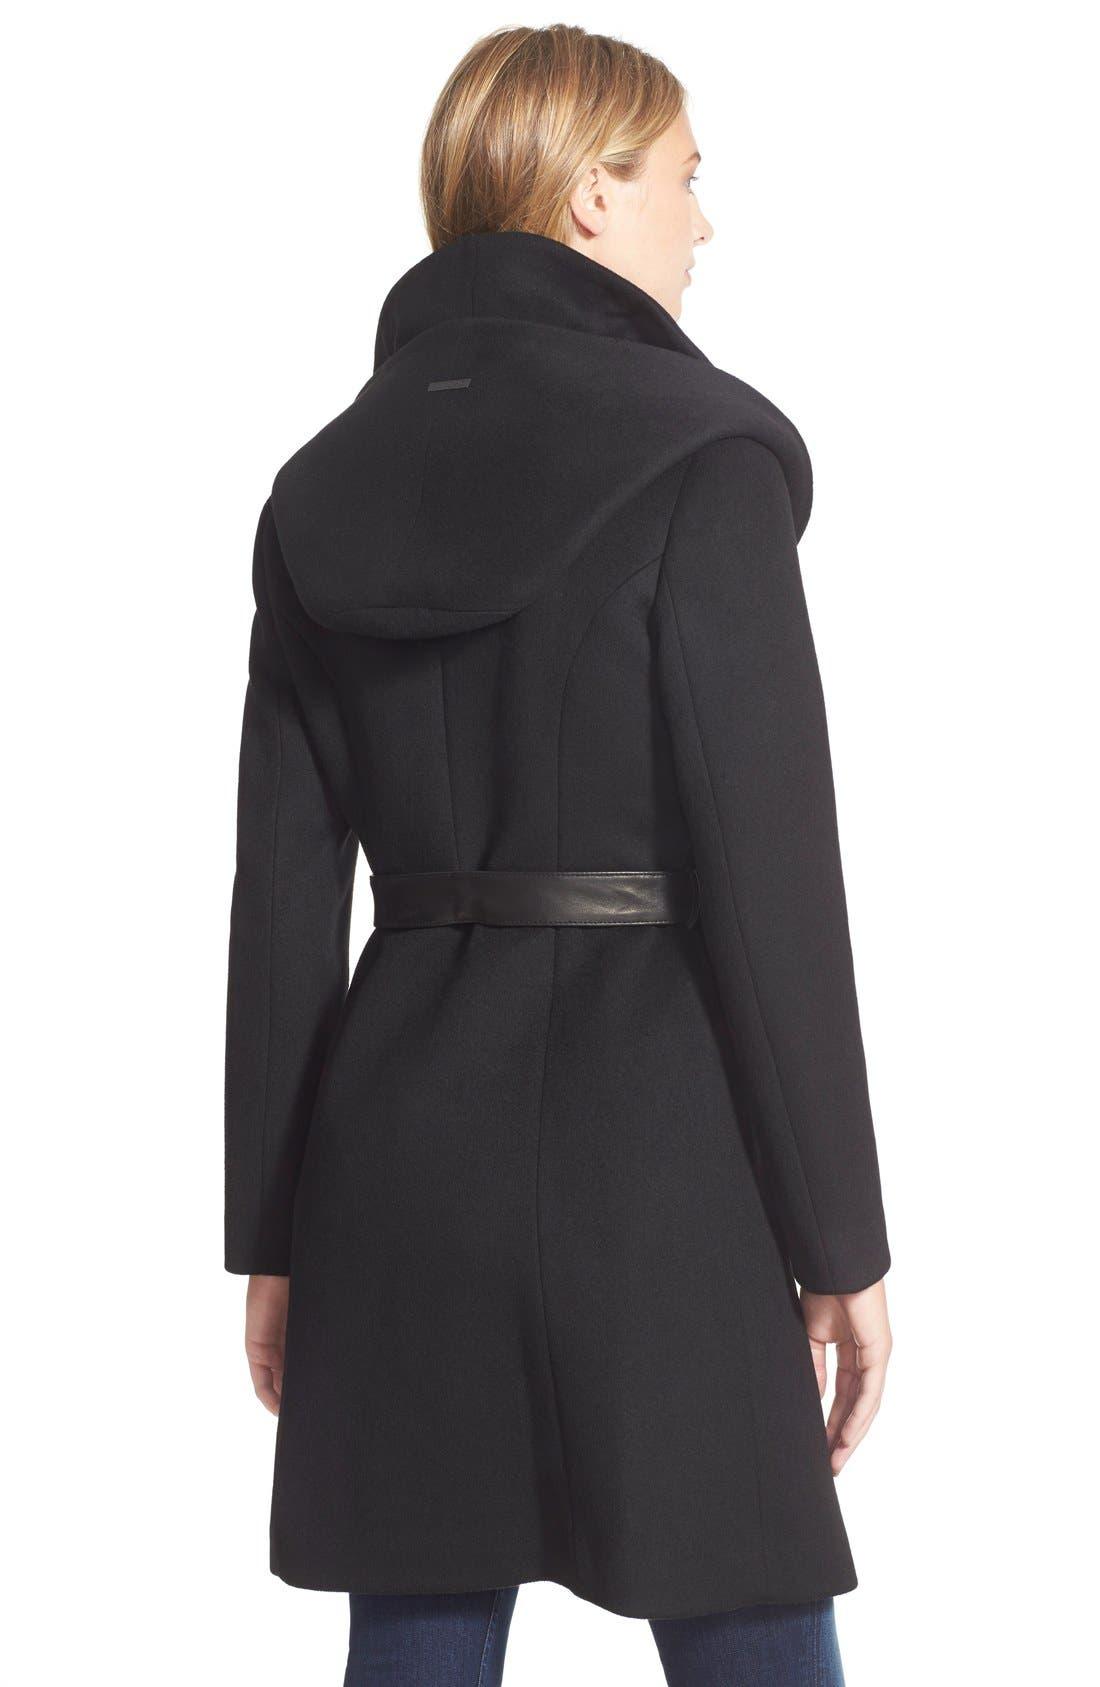 Alternate Image 2  - Soia & Kyo 'Arya' Hooded Wool Blend Coat with Belt